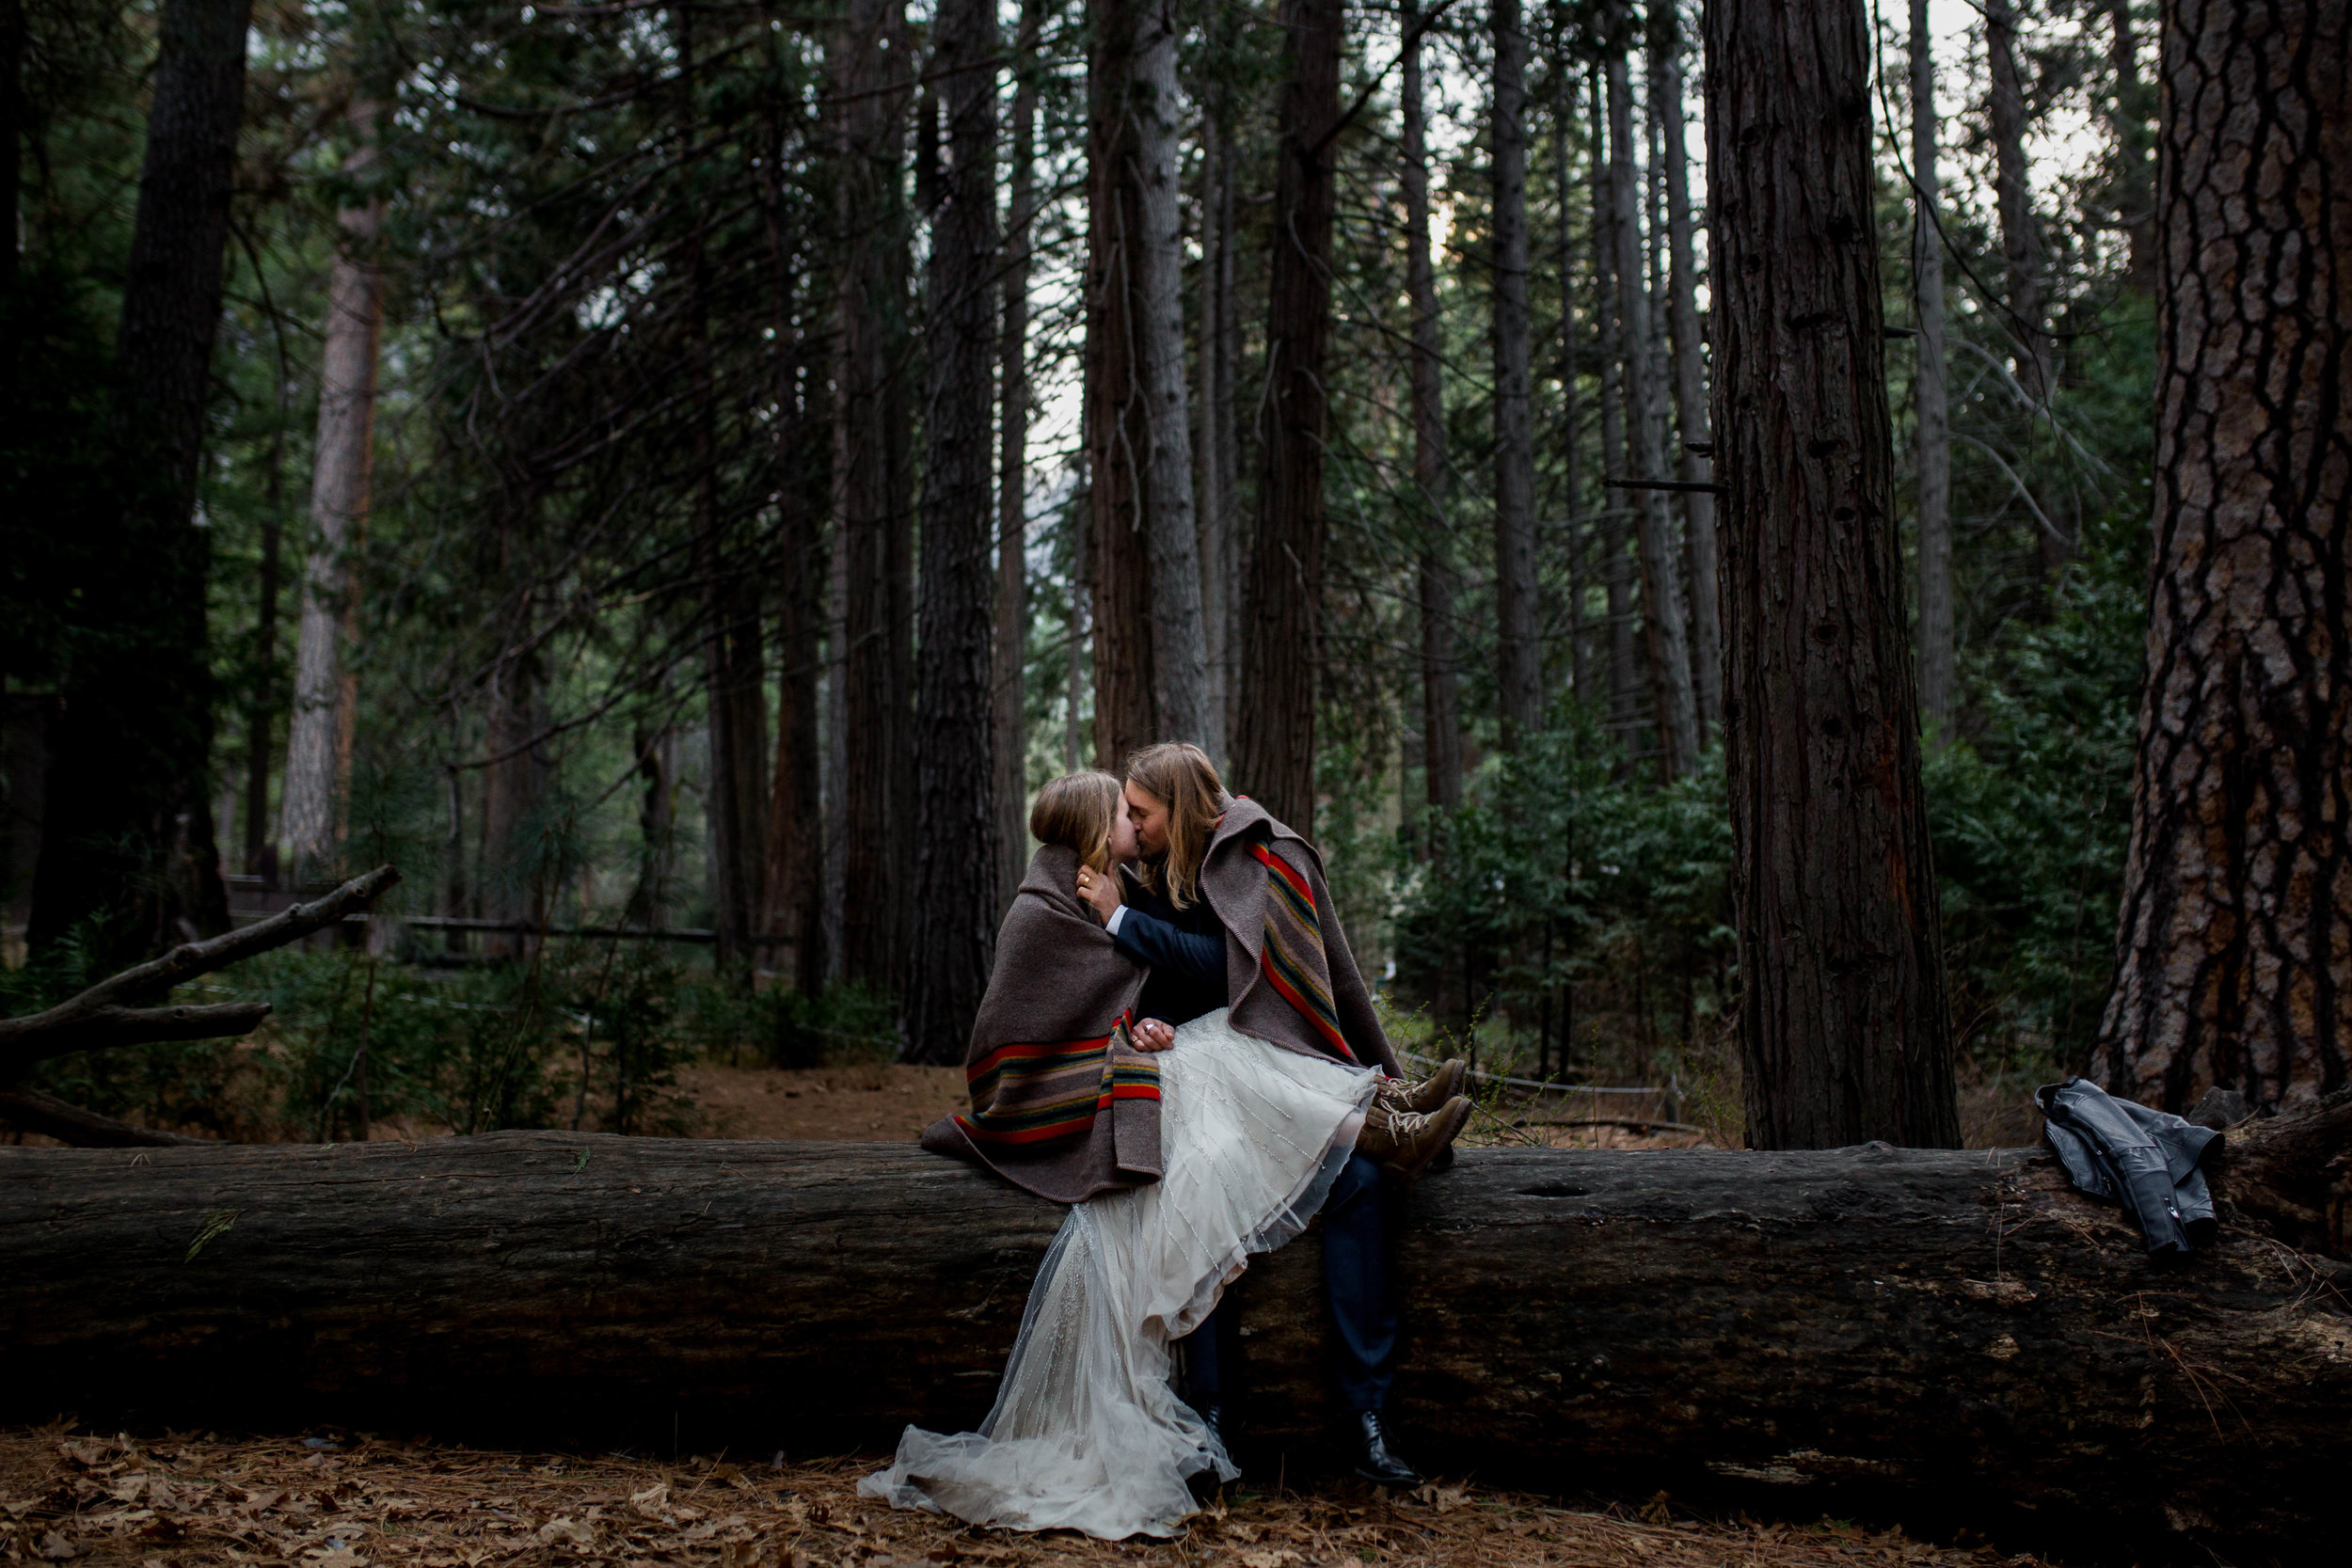 Nicole-Daacke-Photography-Adventurous-Elopement-Intimiate-Wedding-Destination-Wedding-Yosemite-National-Park-Laid-Back-Love-Photographer-4.jpg